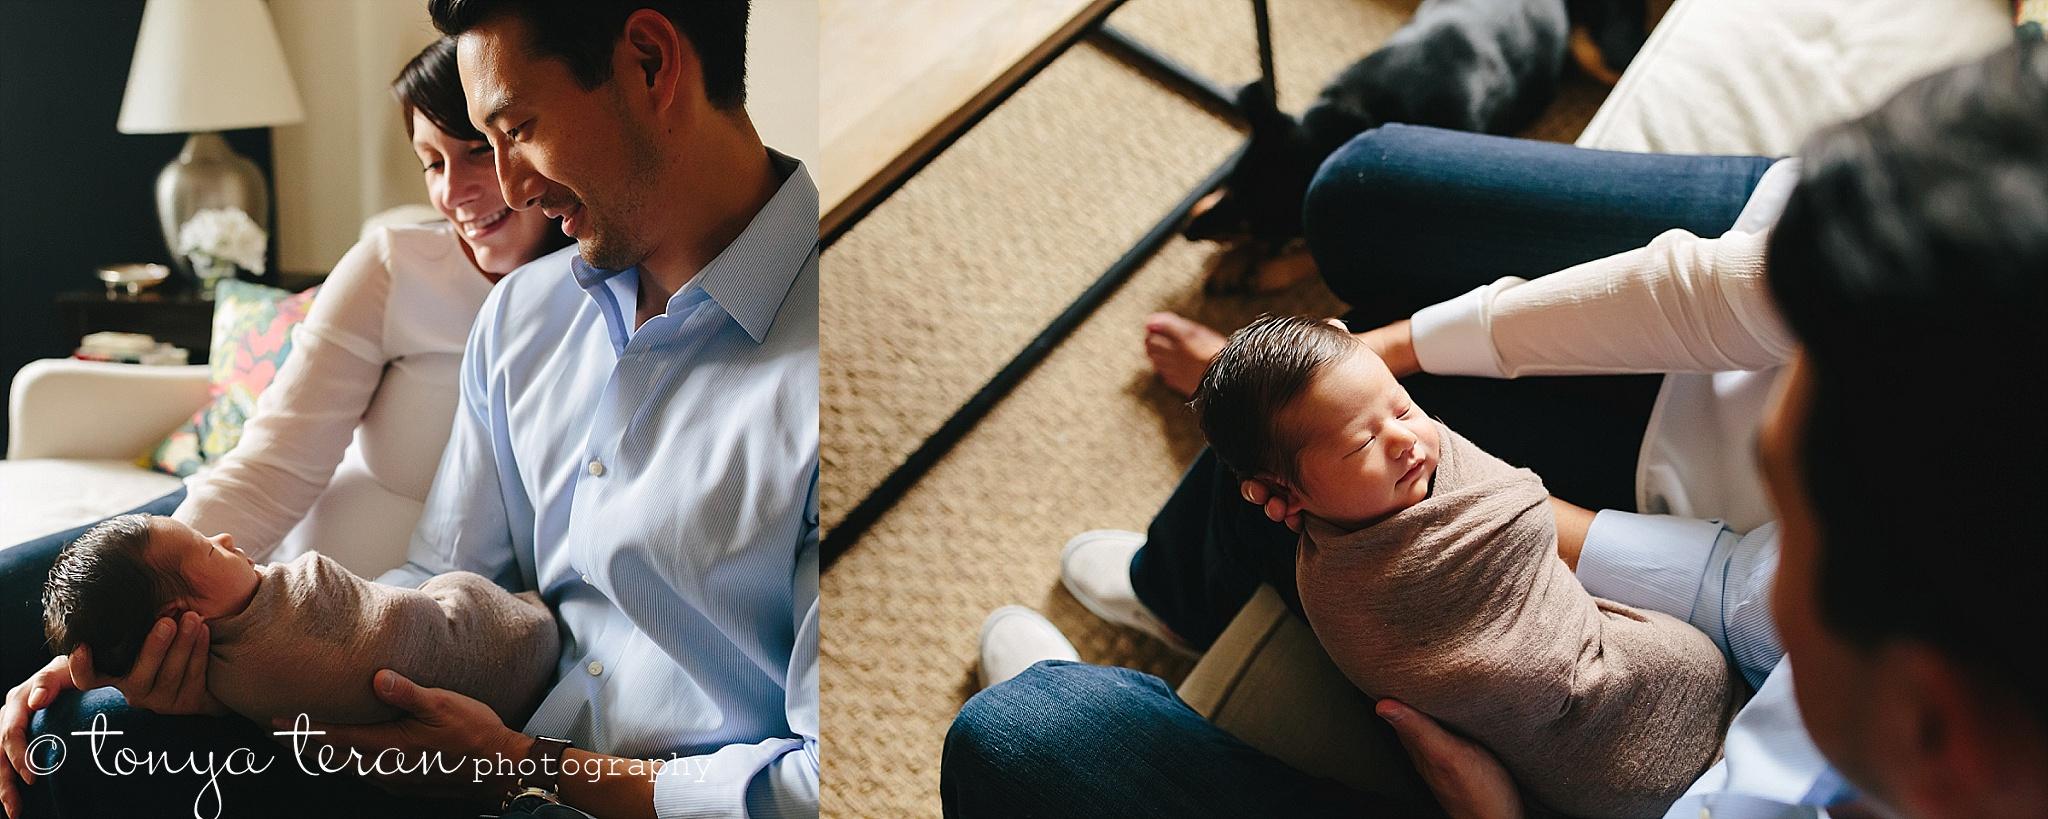 Newborn Photo Session   Tonya Teran Photography, Washington, DC Newborn, Baby, and Family Photographer